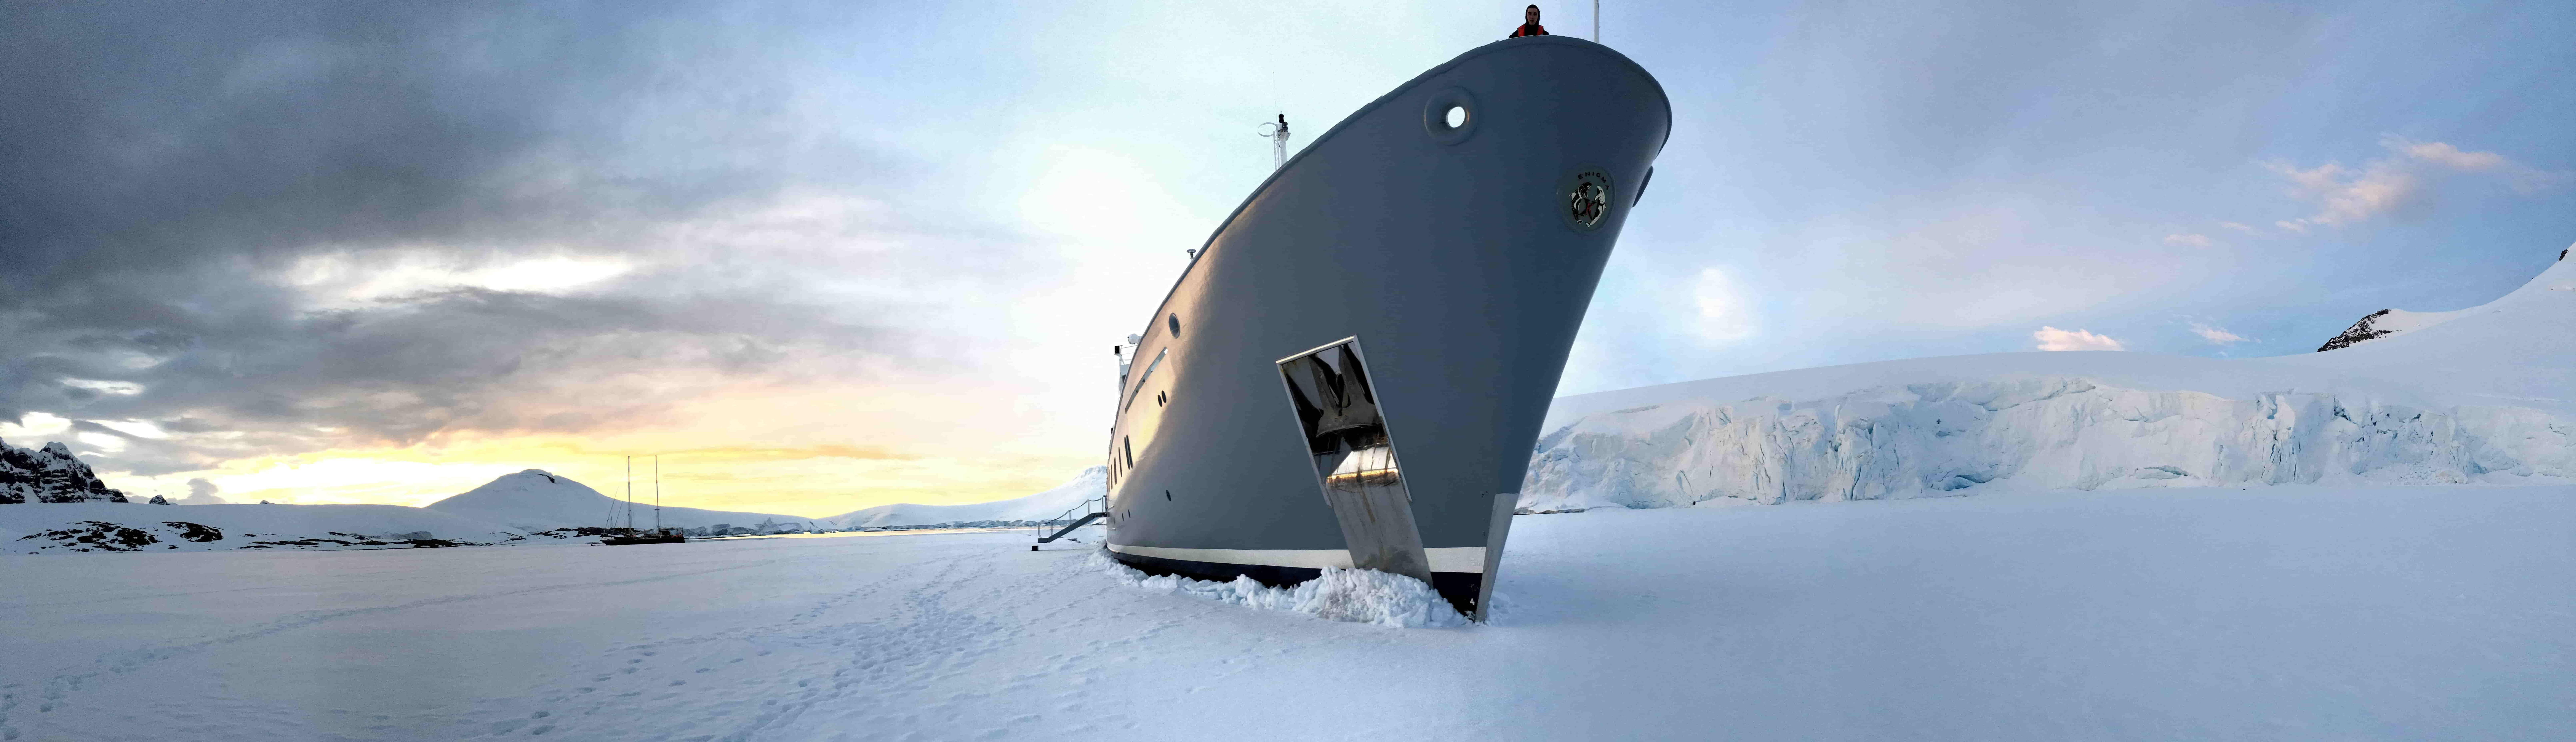 Yacht Breaking Through Ice In Antarctica